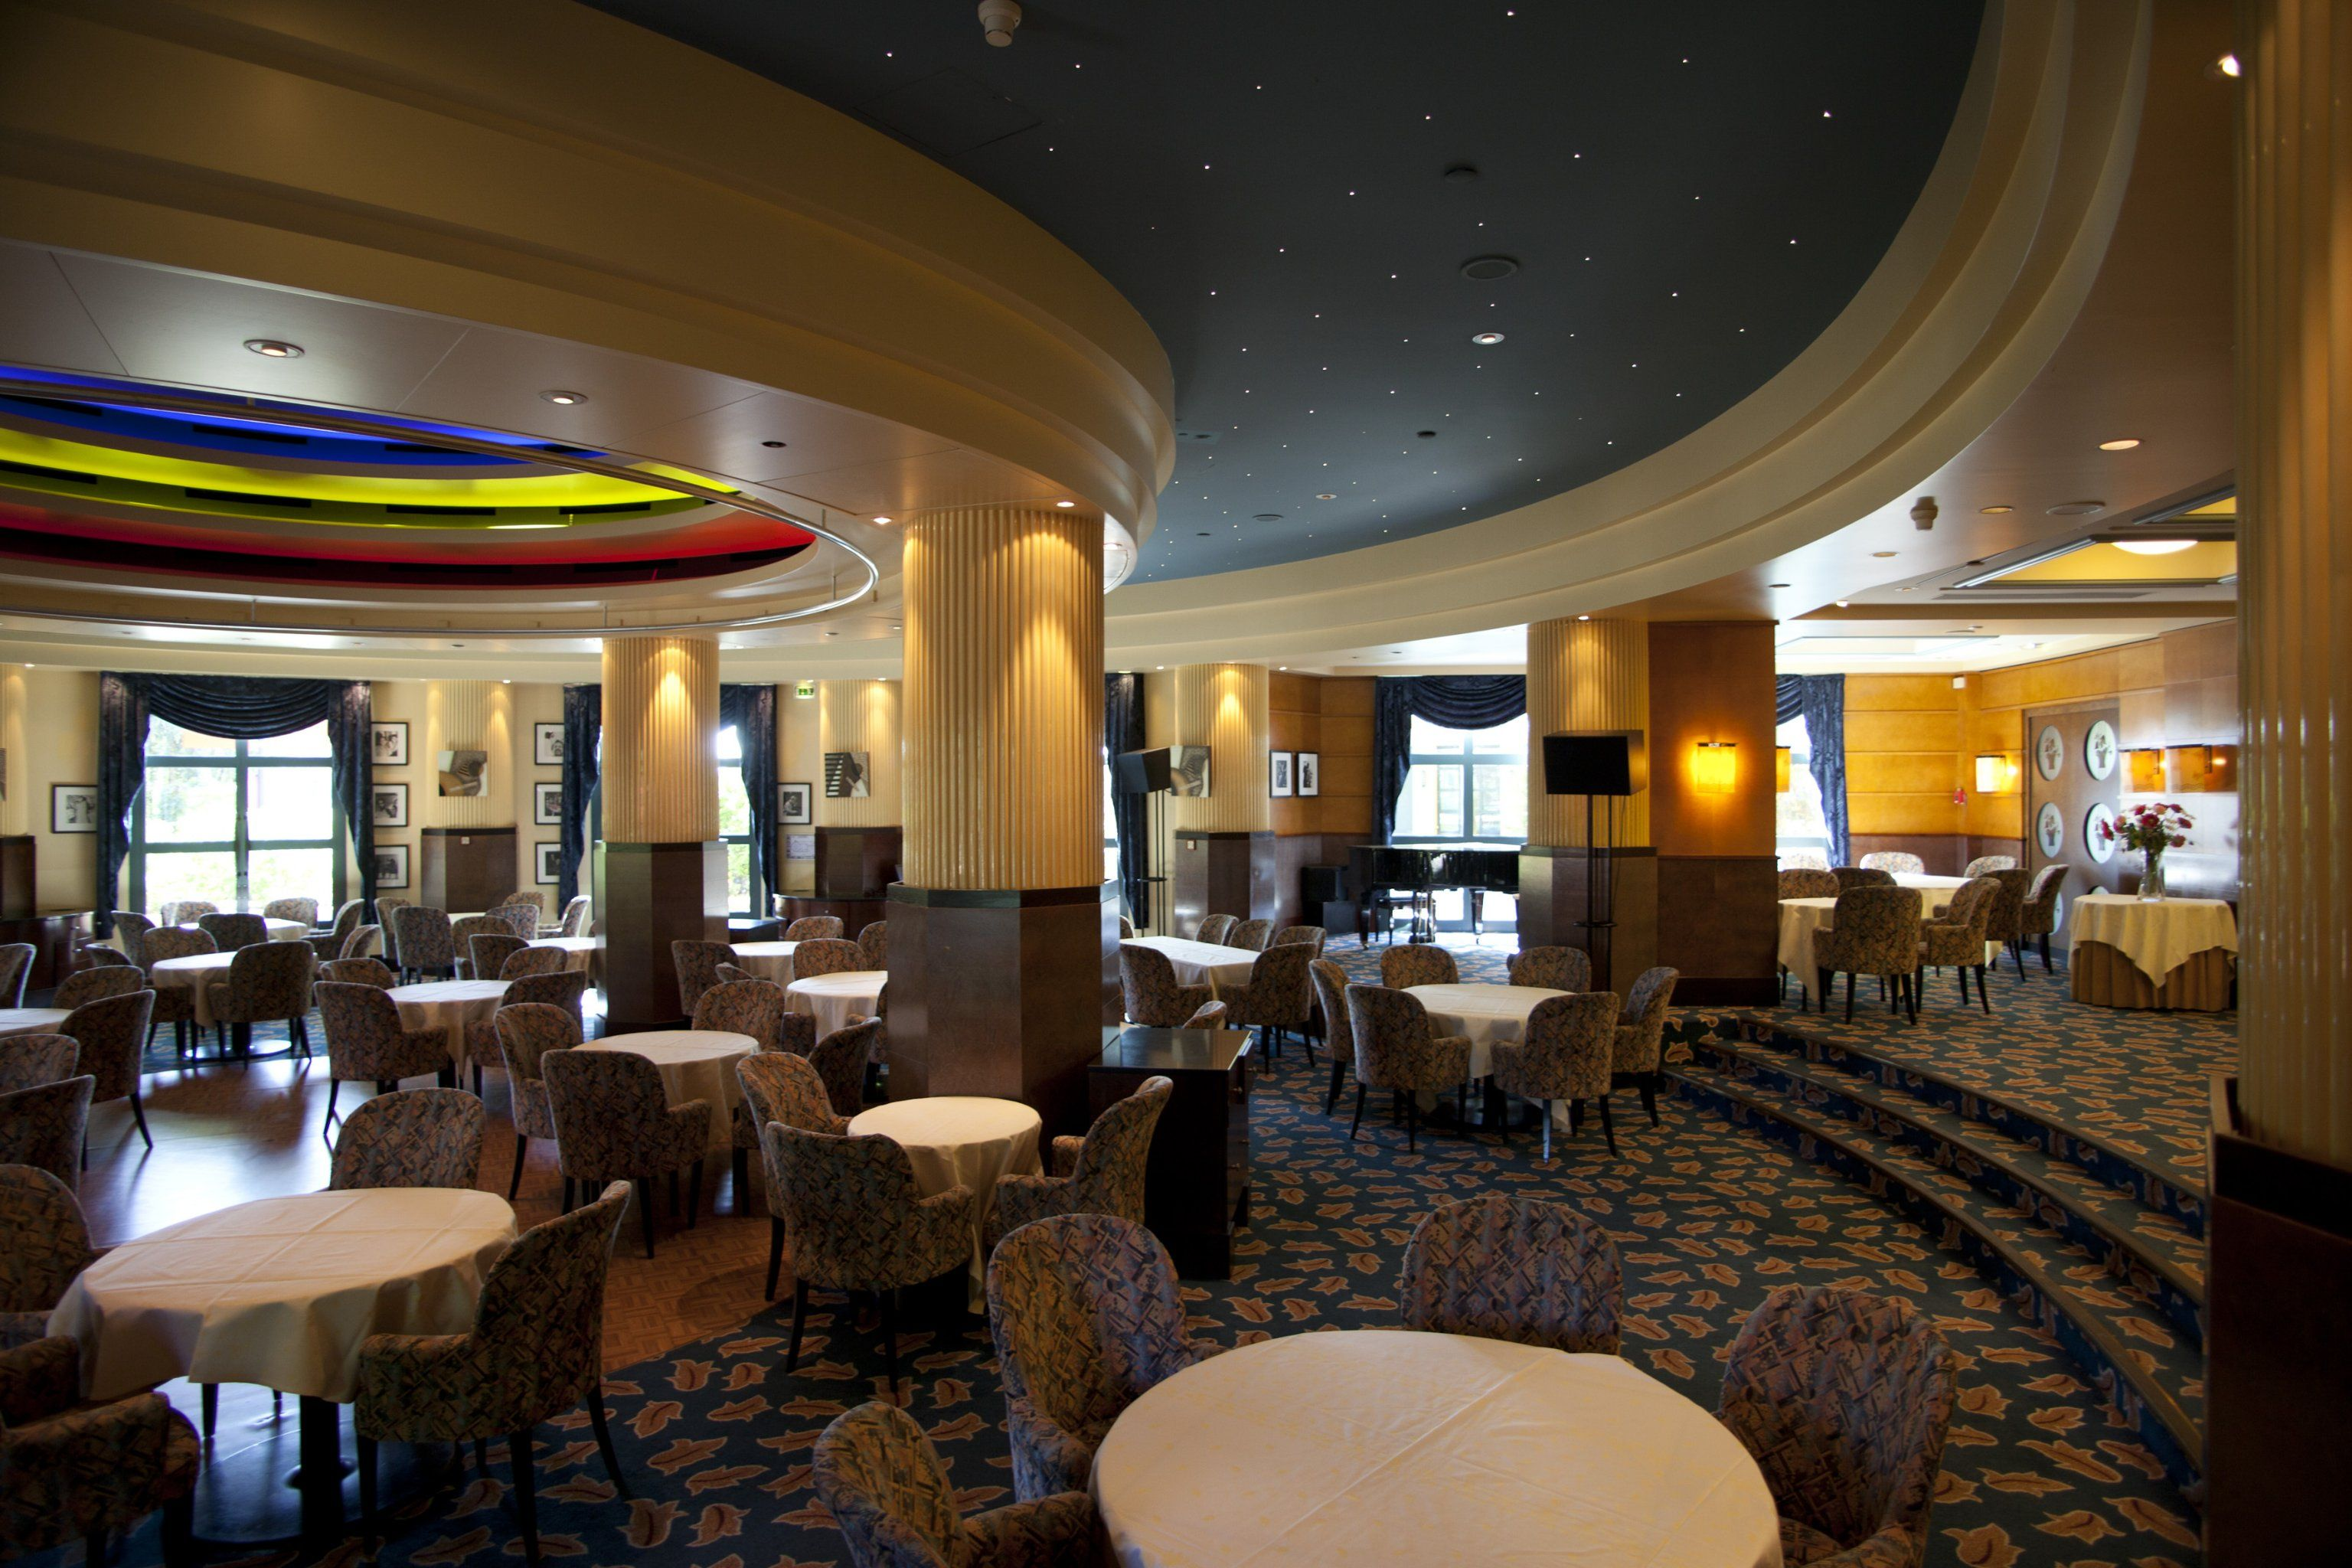 Disney Hotels Hotel New York Manhattan Restaurant Disneyland